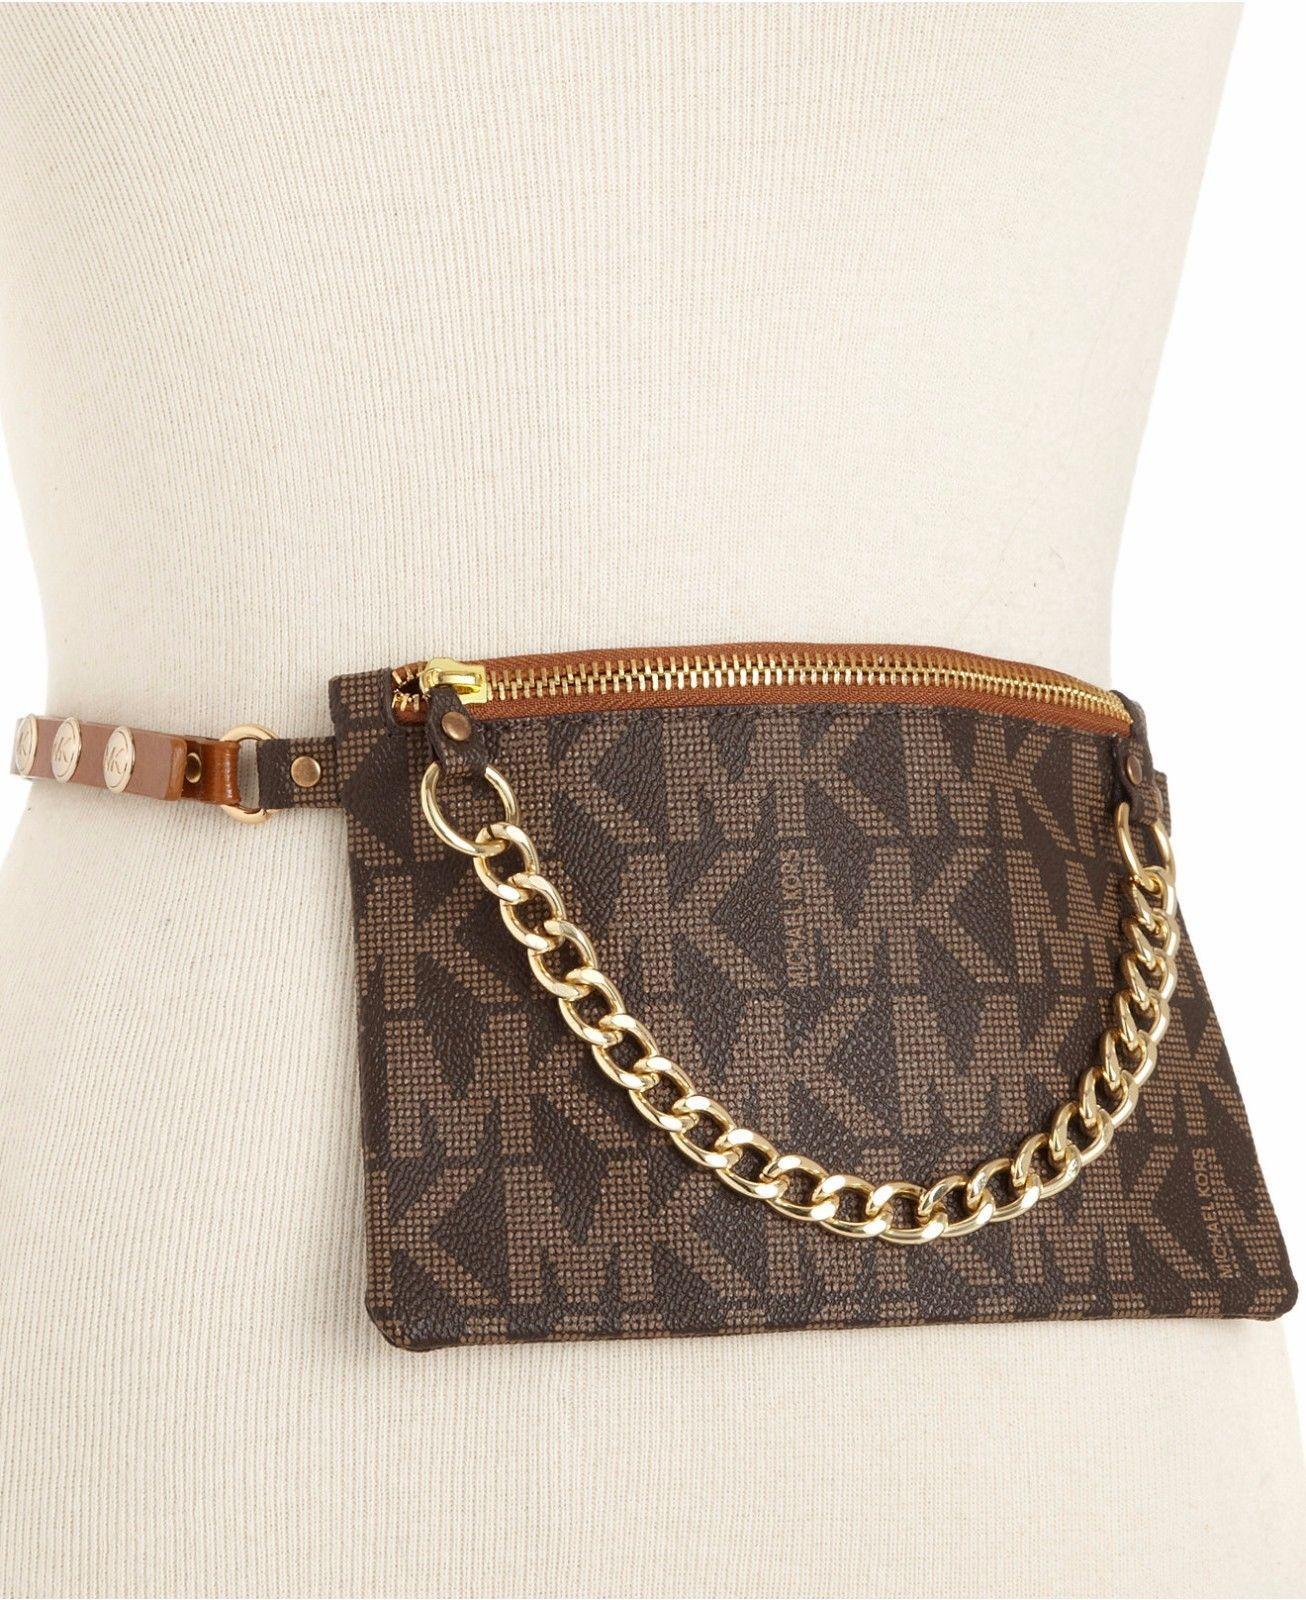 dfba8d555619 Michael Kors Chocolate Brown Monogram Belt Fanny Pack Wristlet Bag NWT s  Small